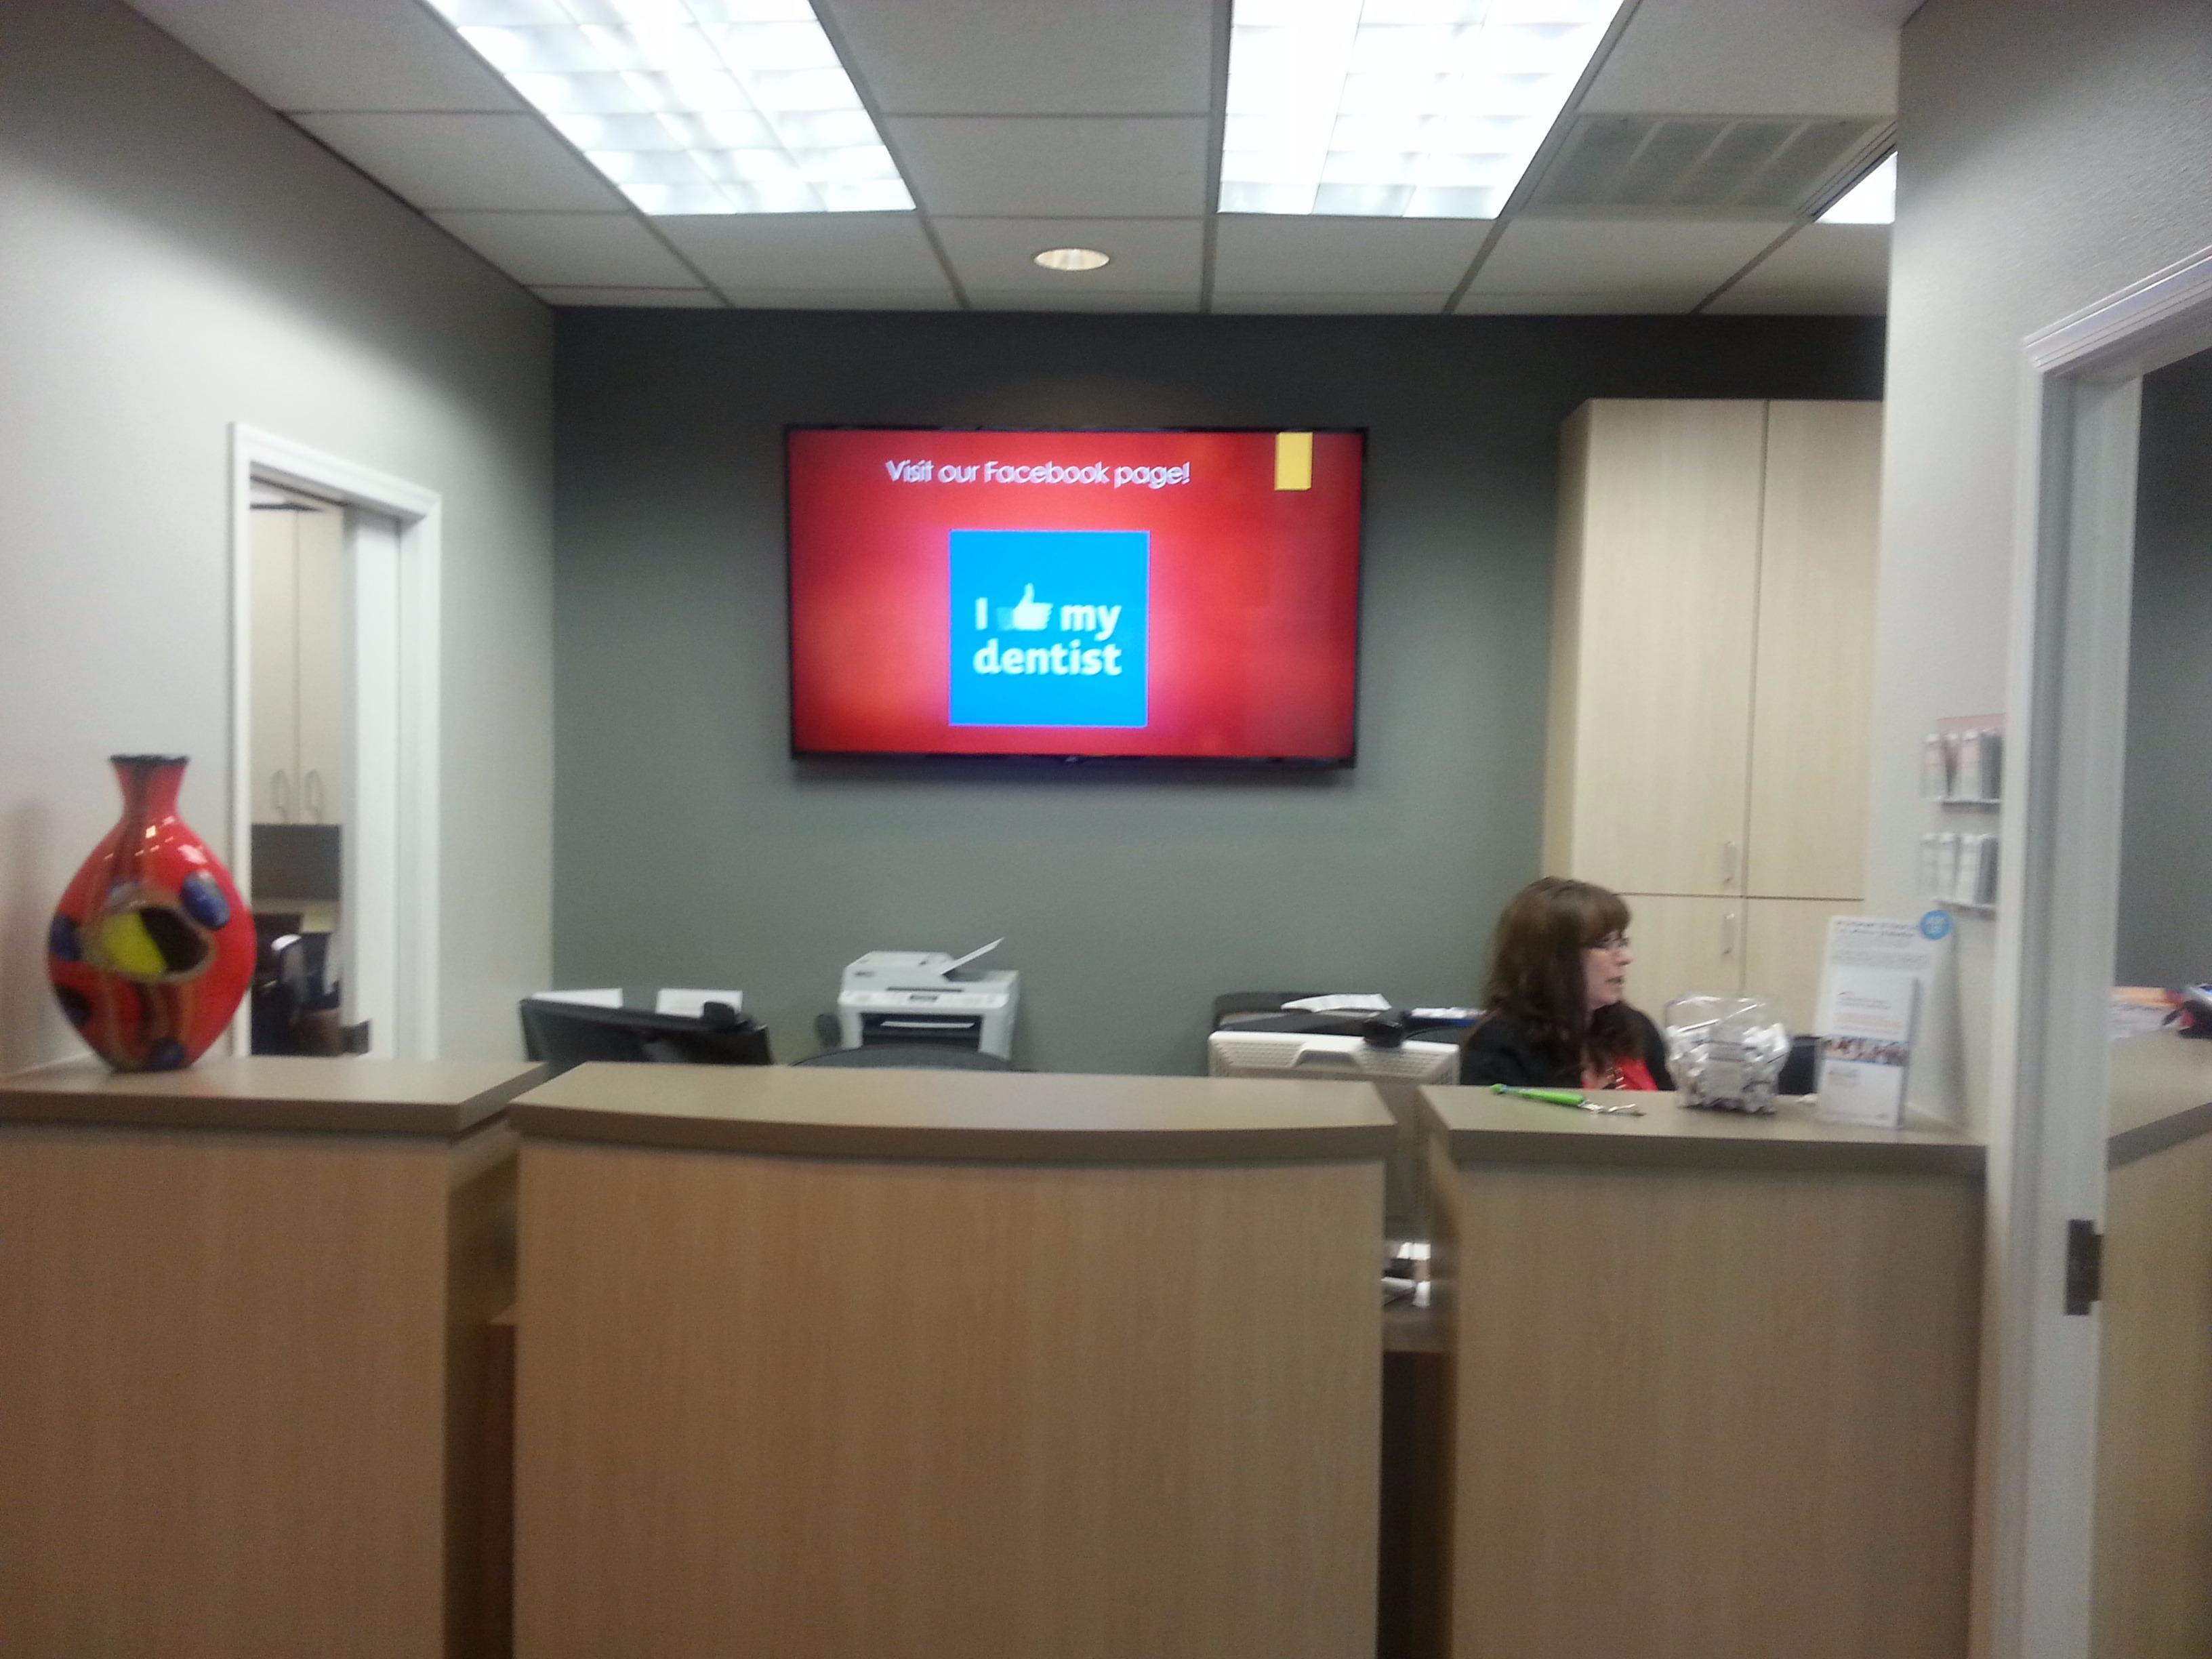 Arizona Biltmore Dentistry in Phoenix, AZ 85018 - ChamberofCommerce.com